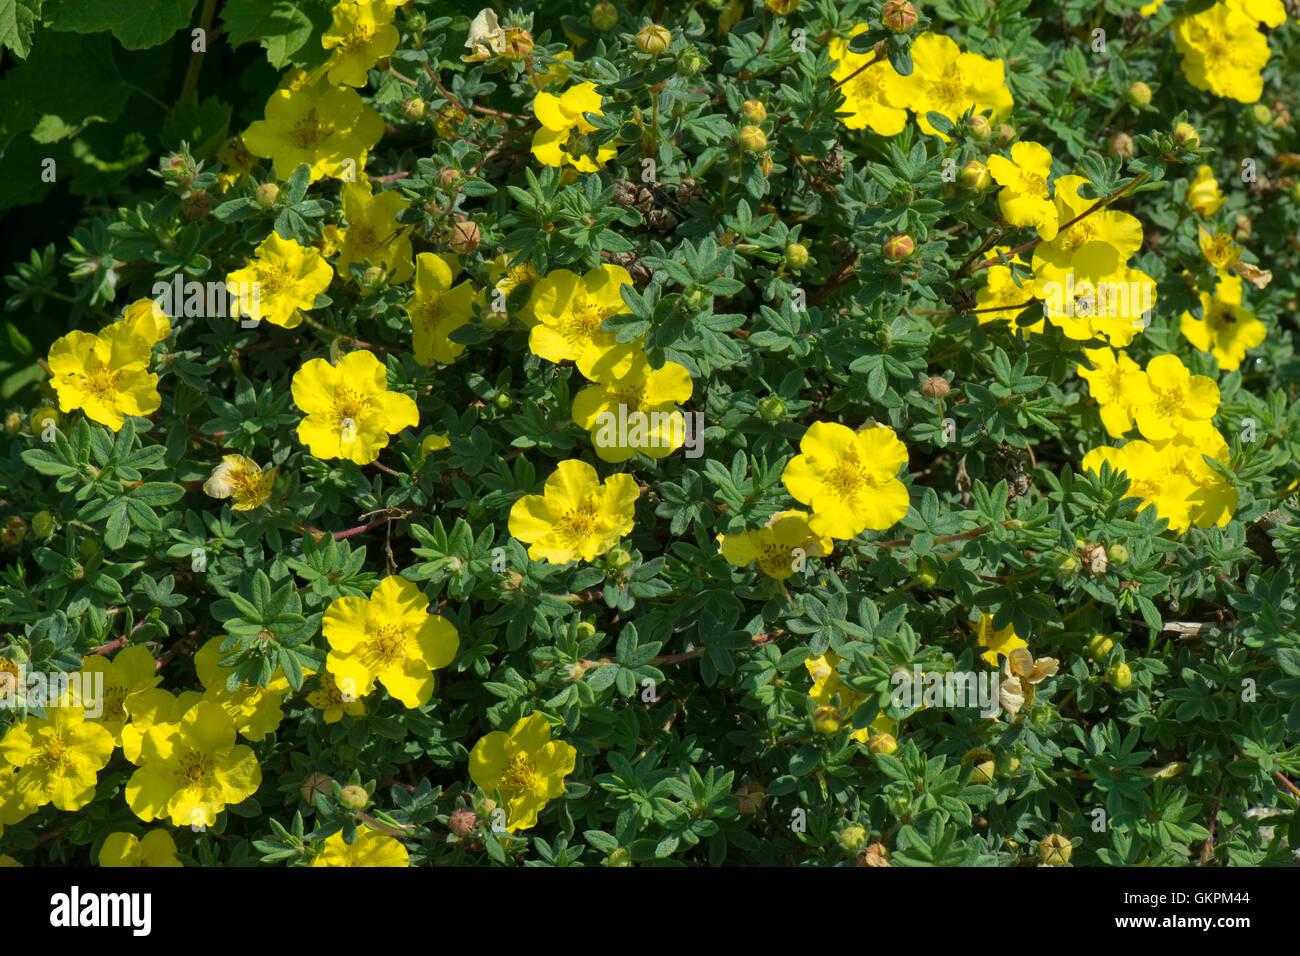 Yellow flowers of shrubby cinquefoil potentilla fruticosa medicine yellow flowers of shrubby cinquefoil potentilla fruticosa medicine wheel mountain berkshire june mightylinksfo